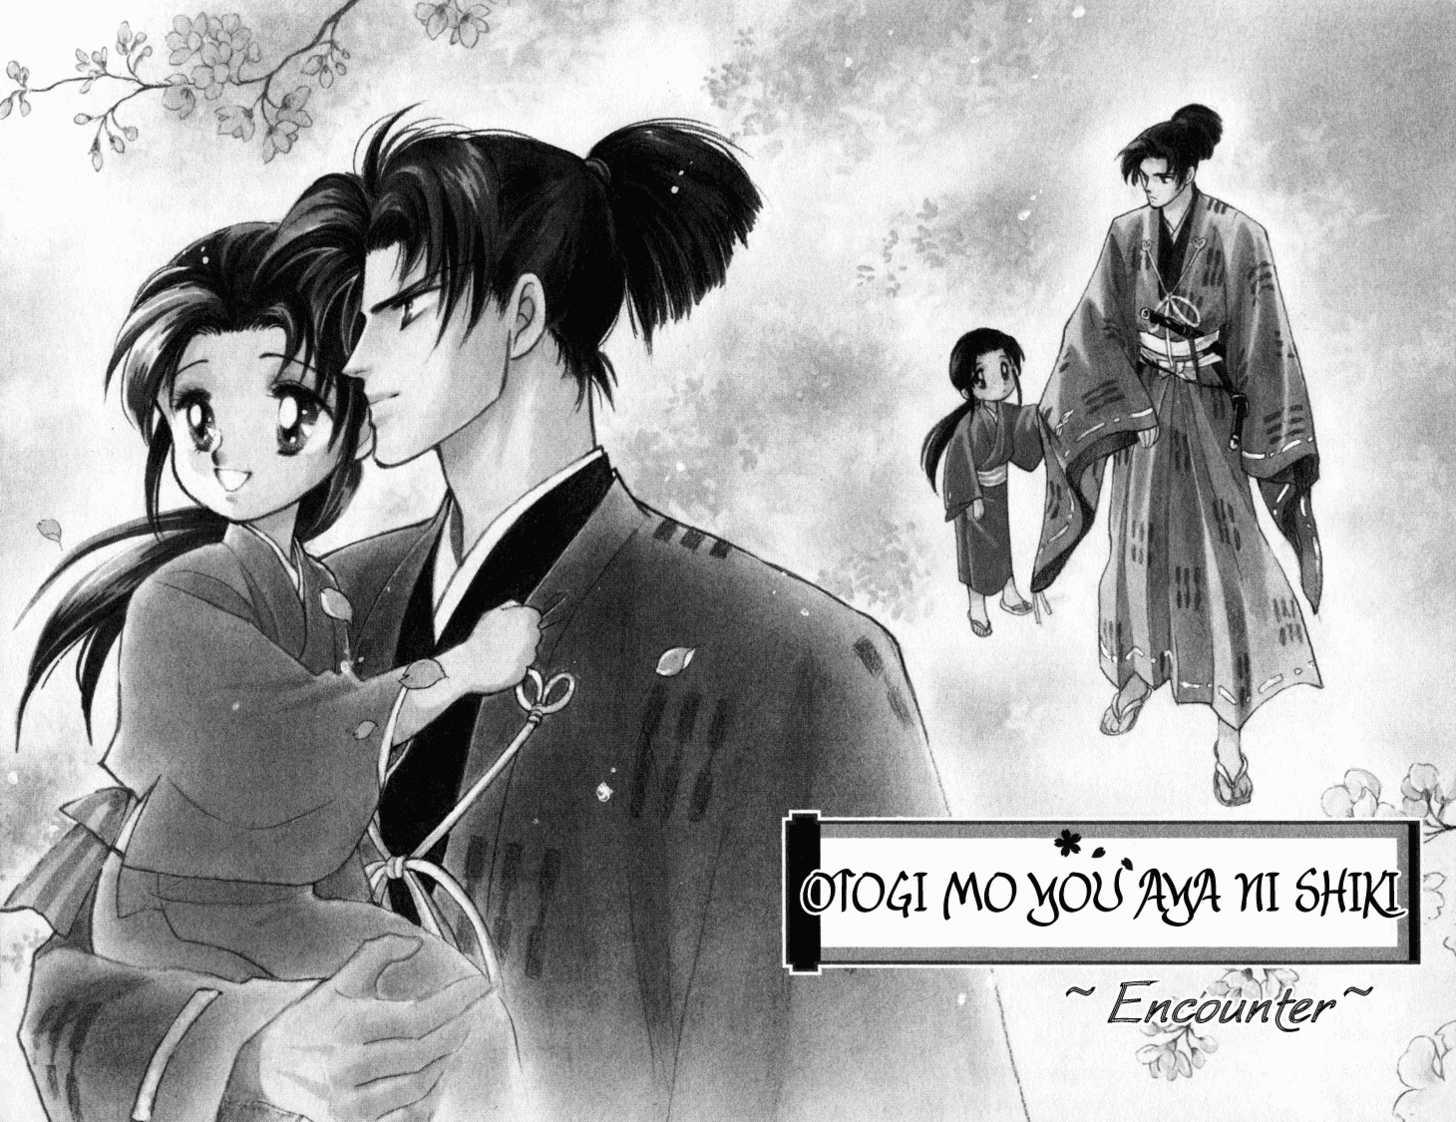 Otogi Moyou Ayanishiki 2 Page 1